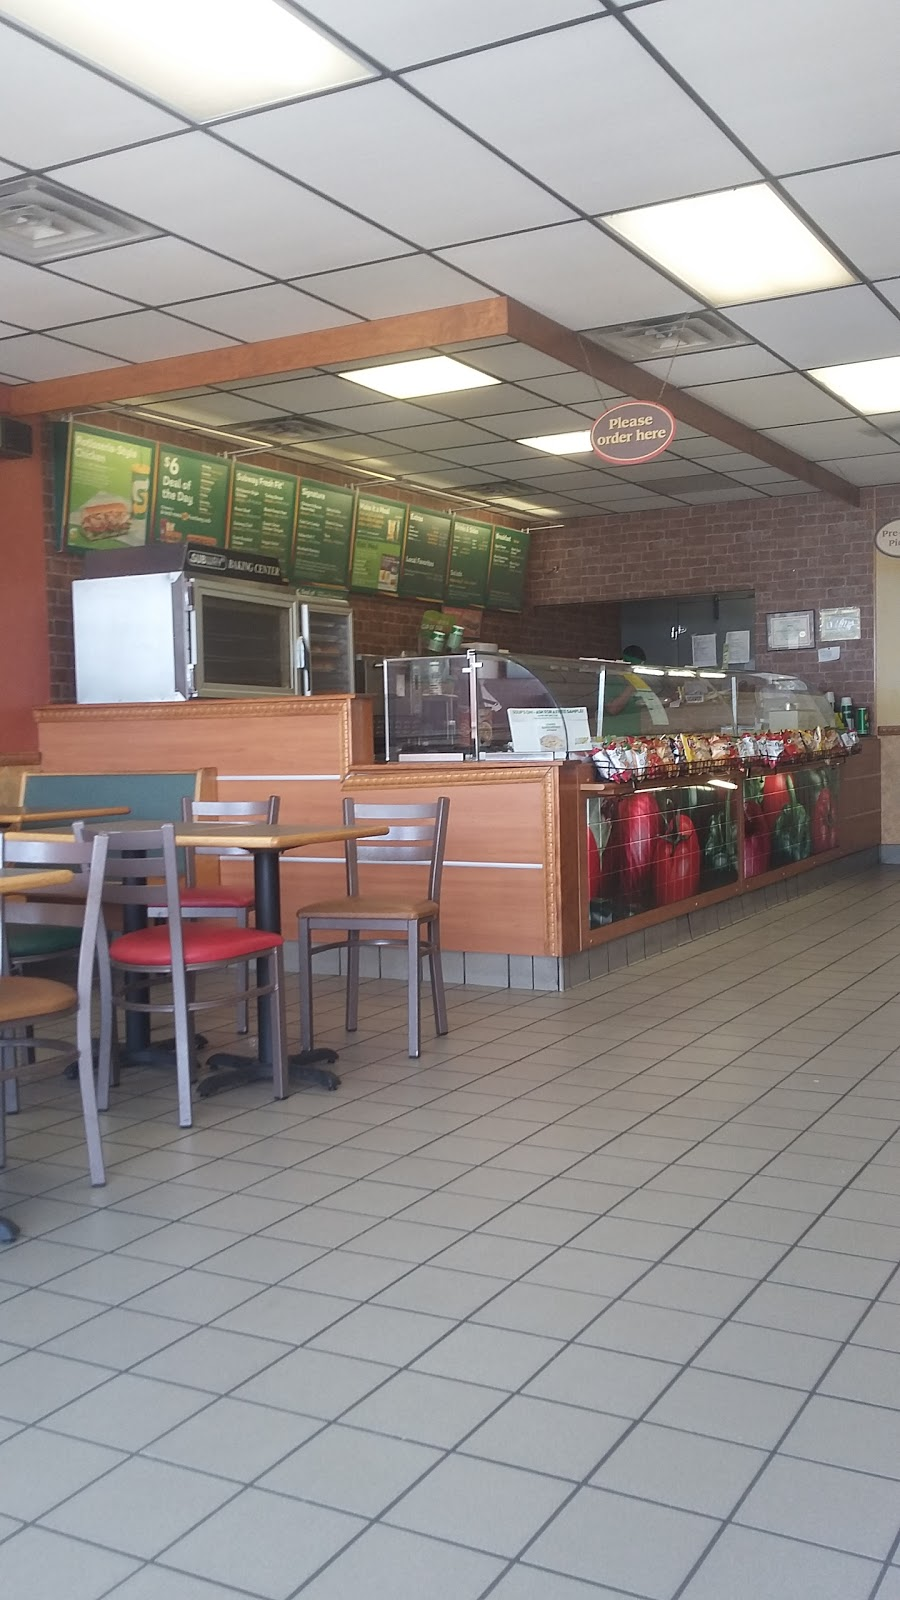 Subway Restaurants - restaurant    Photo 5 of 10   Address: 109 W Ovilla Rd, Red Oak, TX 75154, USA   Phone: (972) 230-7850